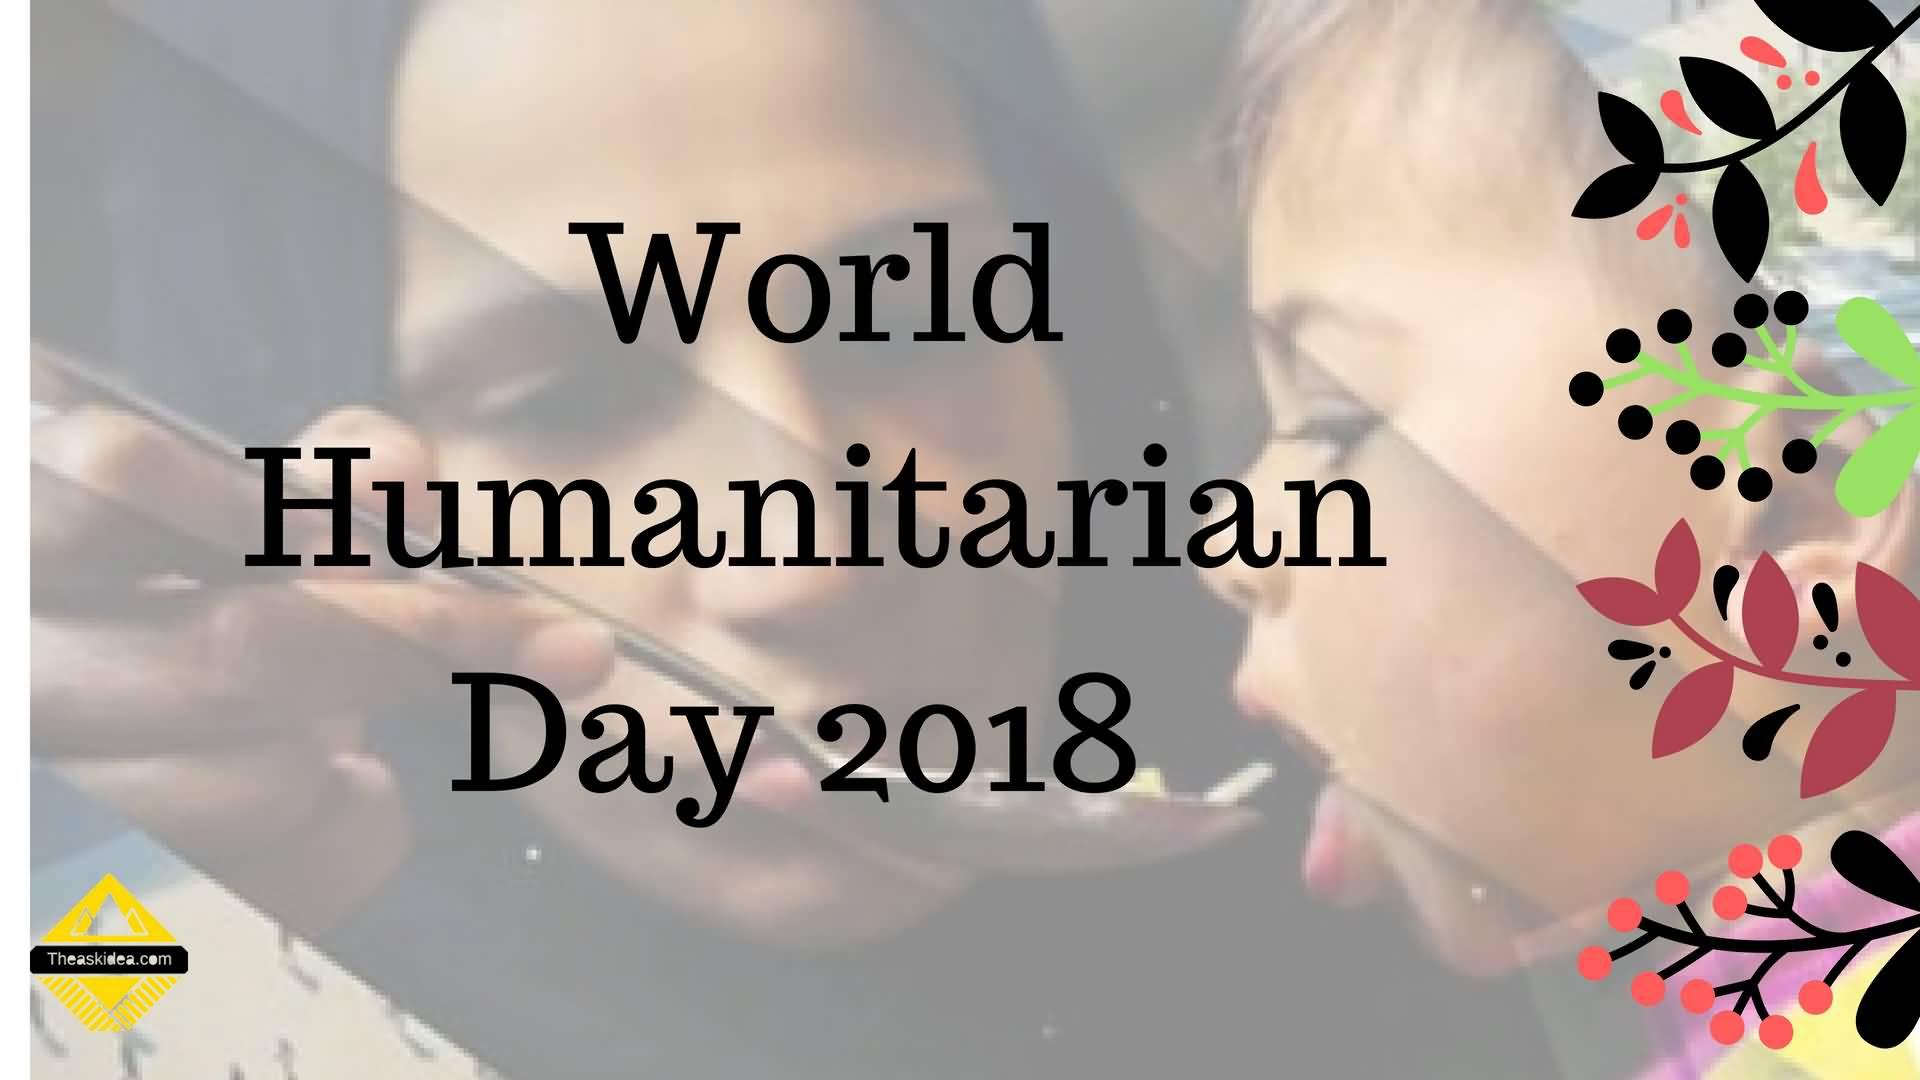 Inspire The World's World Humanitarian Day